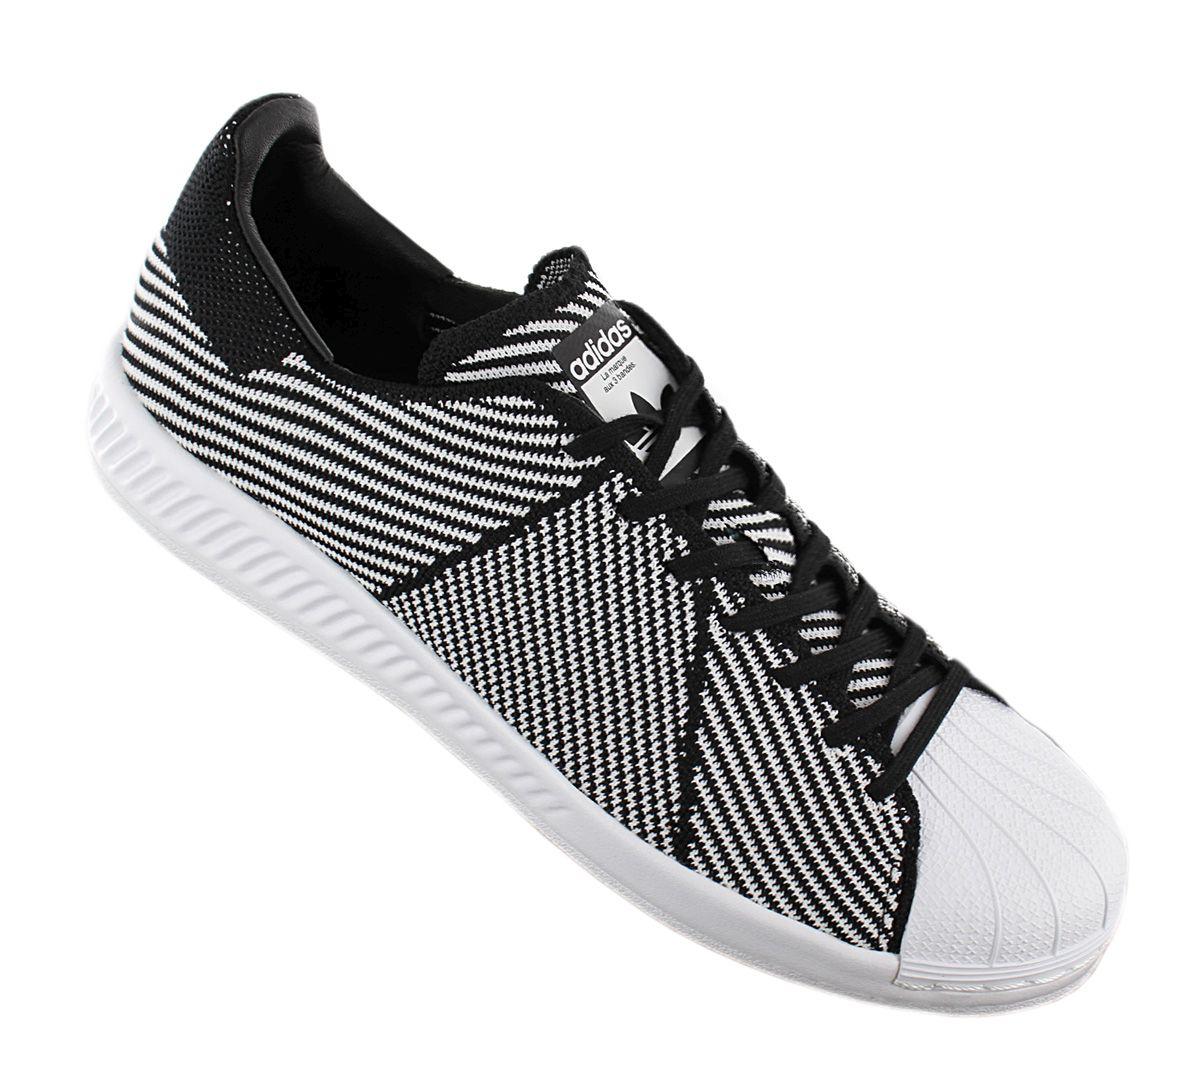 NEW adidas Originals Superstar Bounce